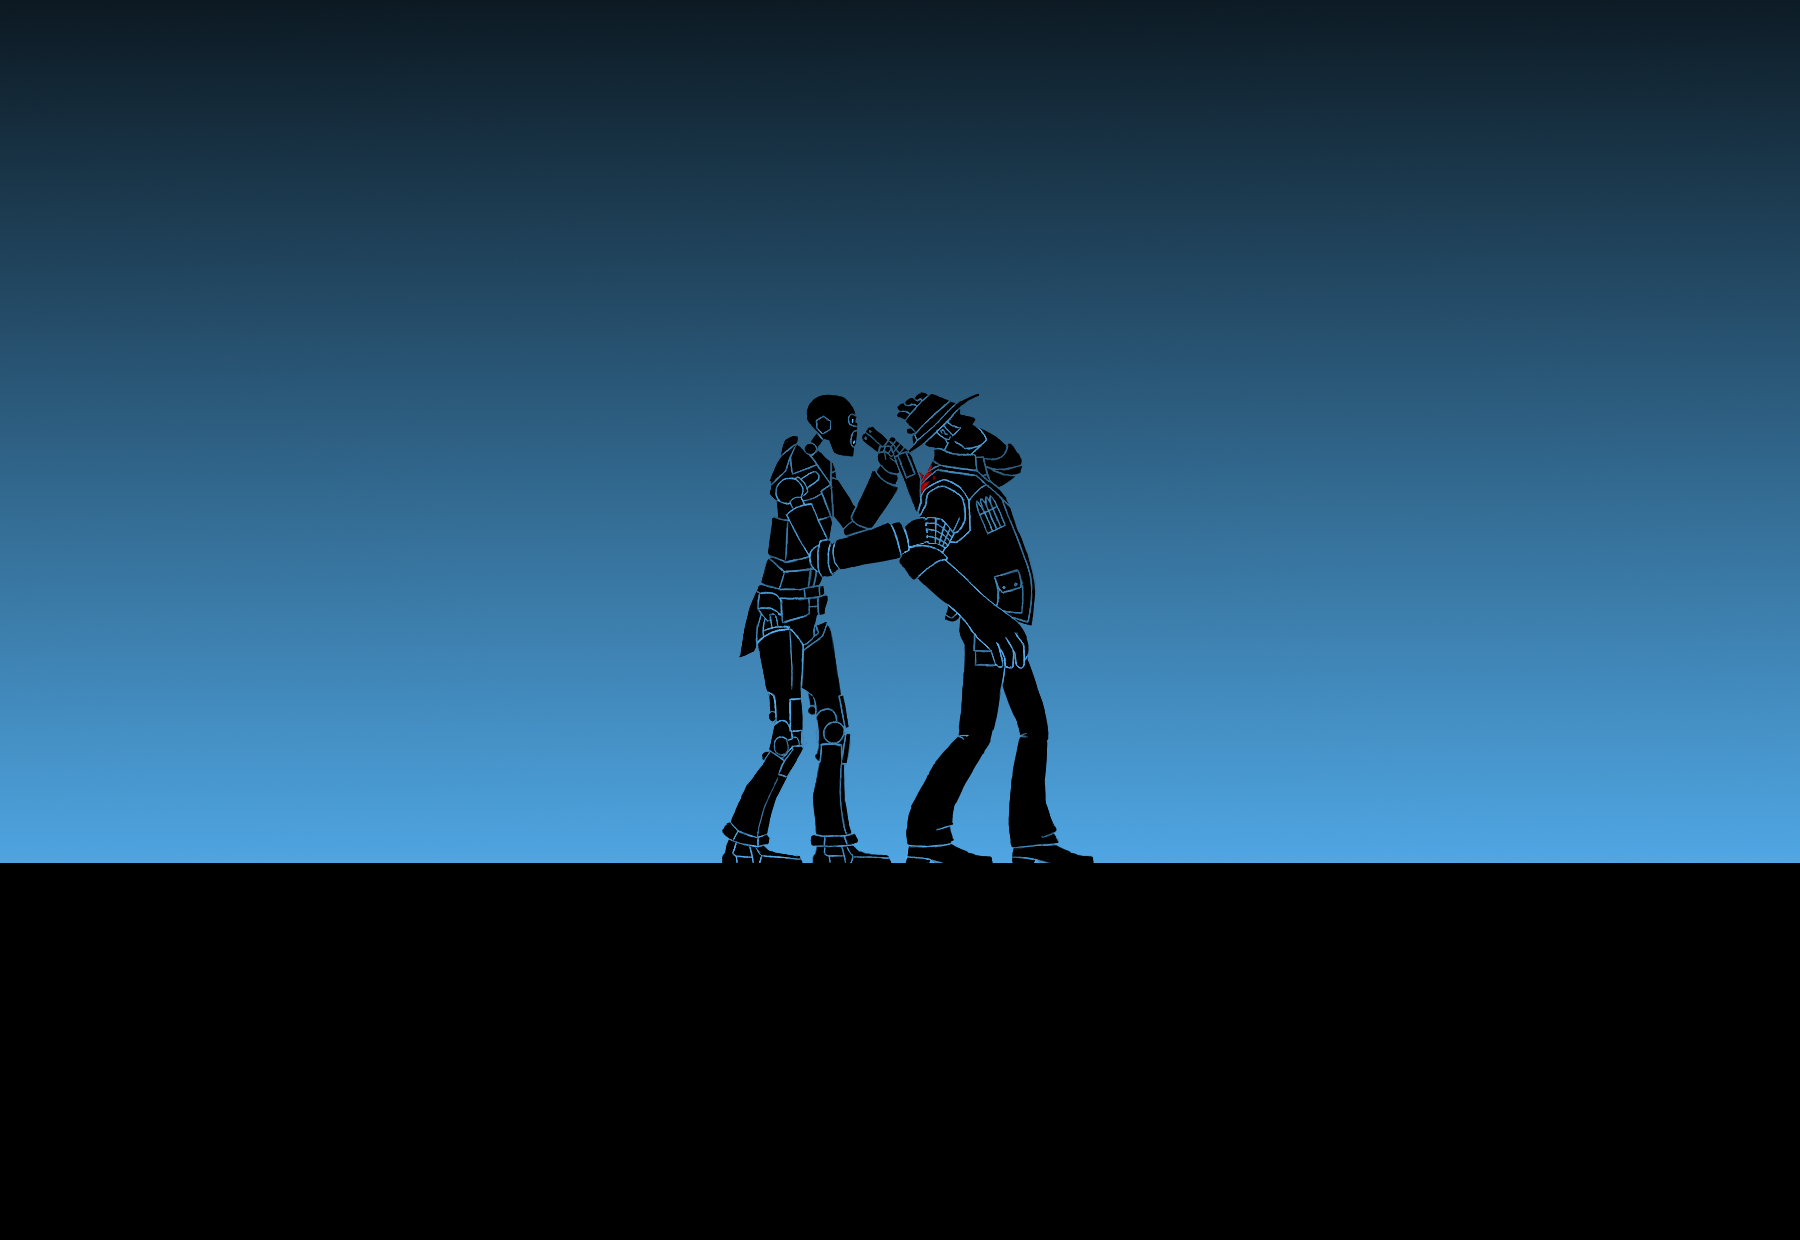 TF2 Spy Bot X Sniper Wallpaper By Bielek